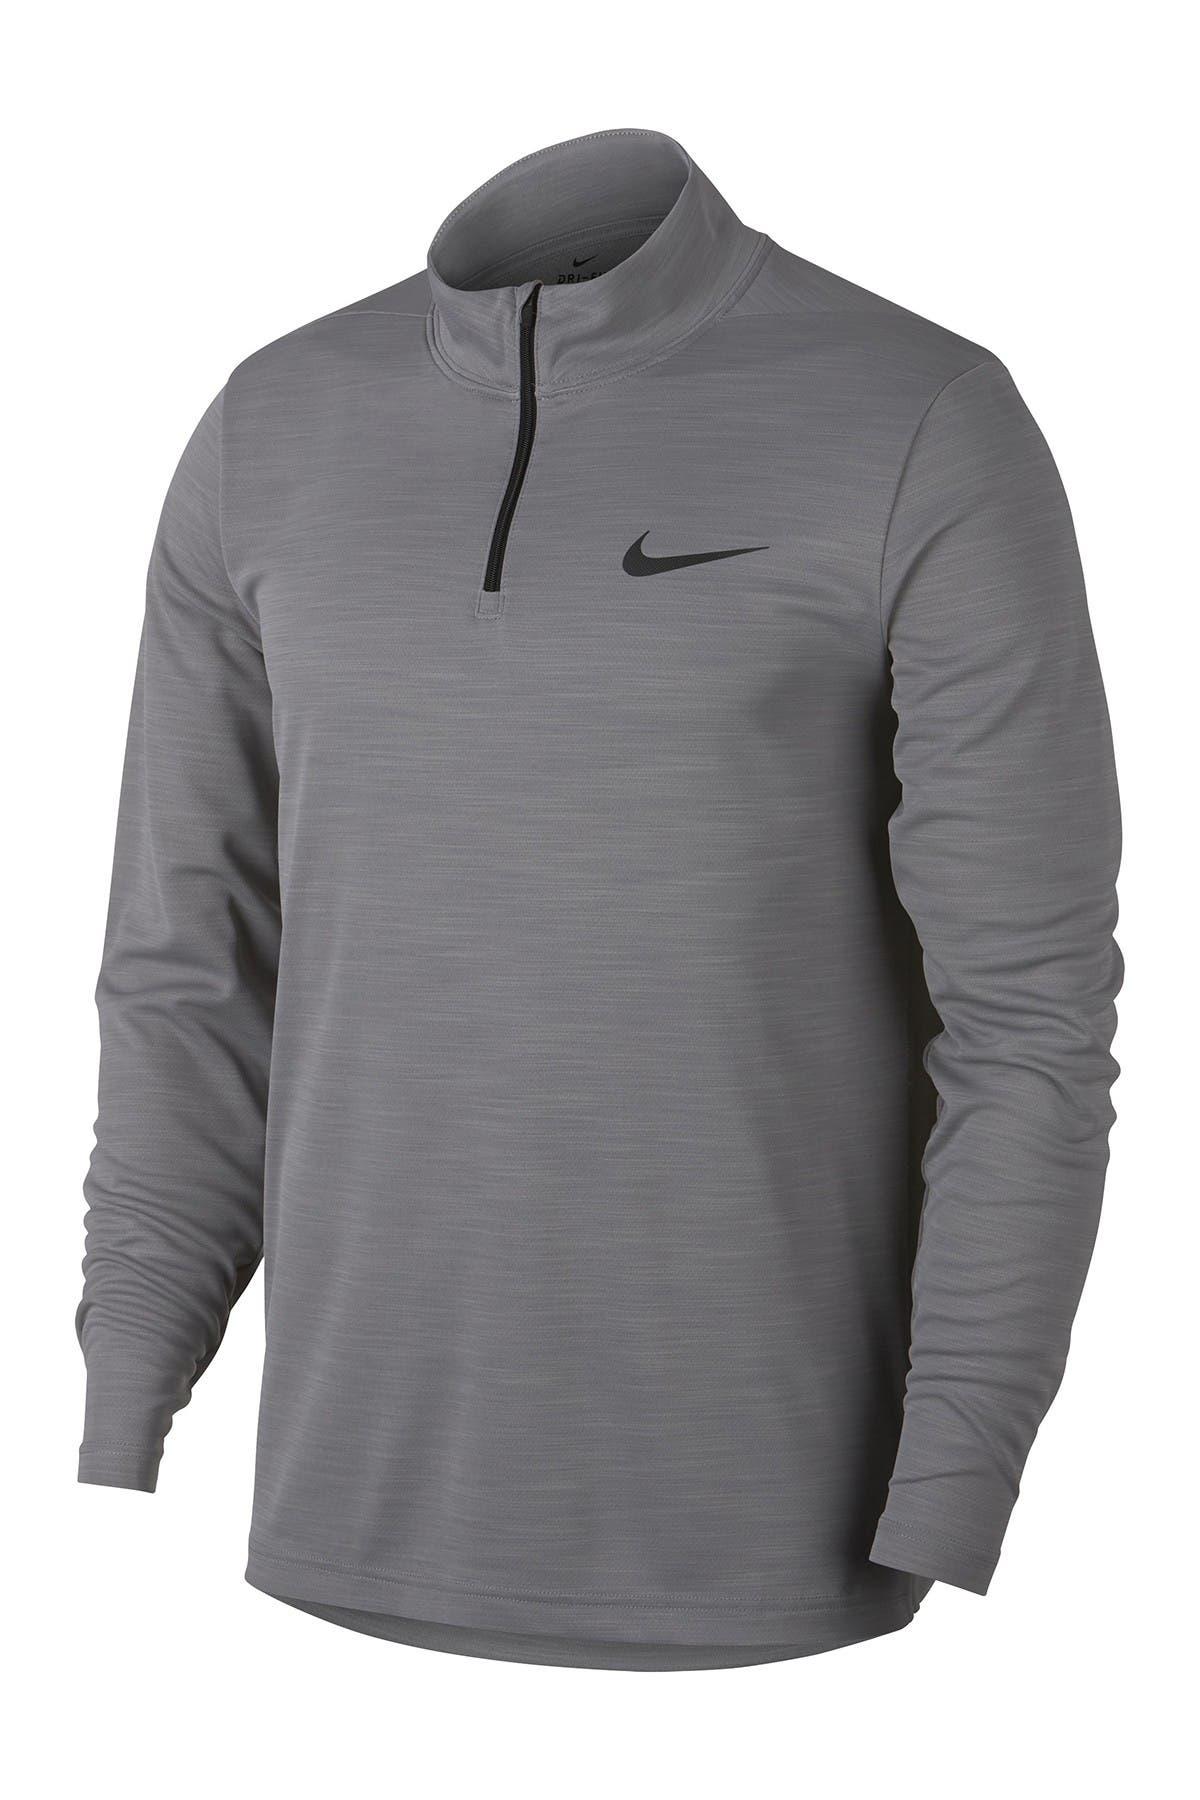 Image of Nike Superset Dri-FIT Quarter Zip Training Pullover